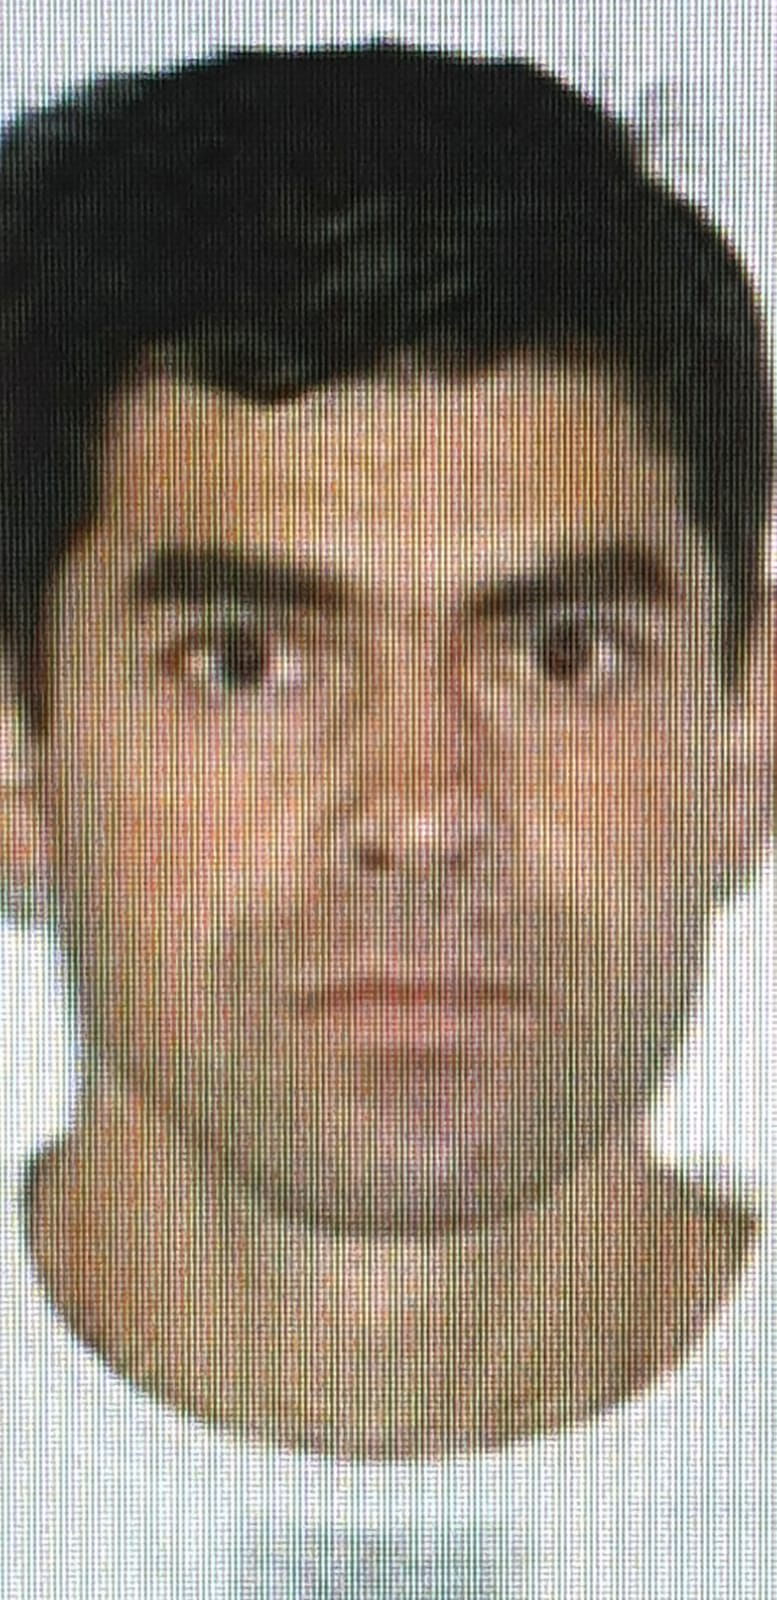 Bărbat din Lugoj, dat dispărut